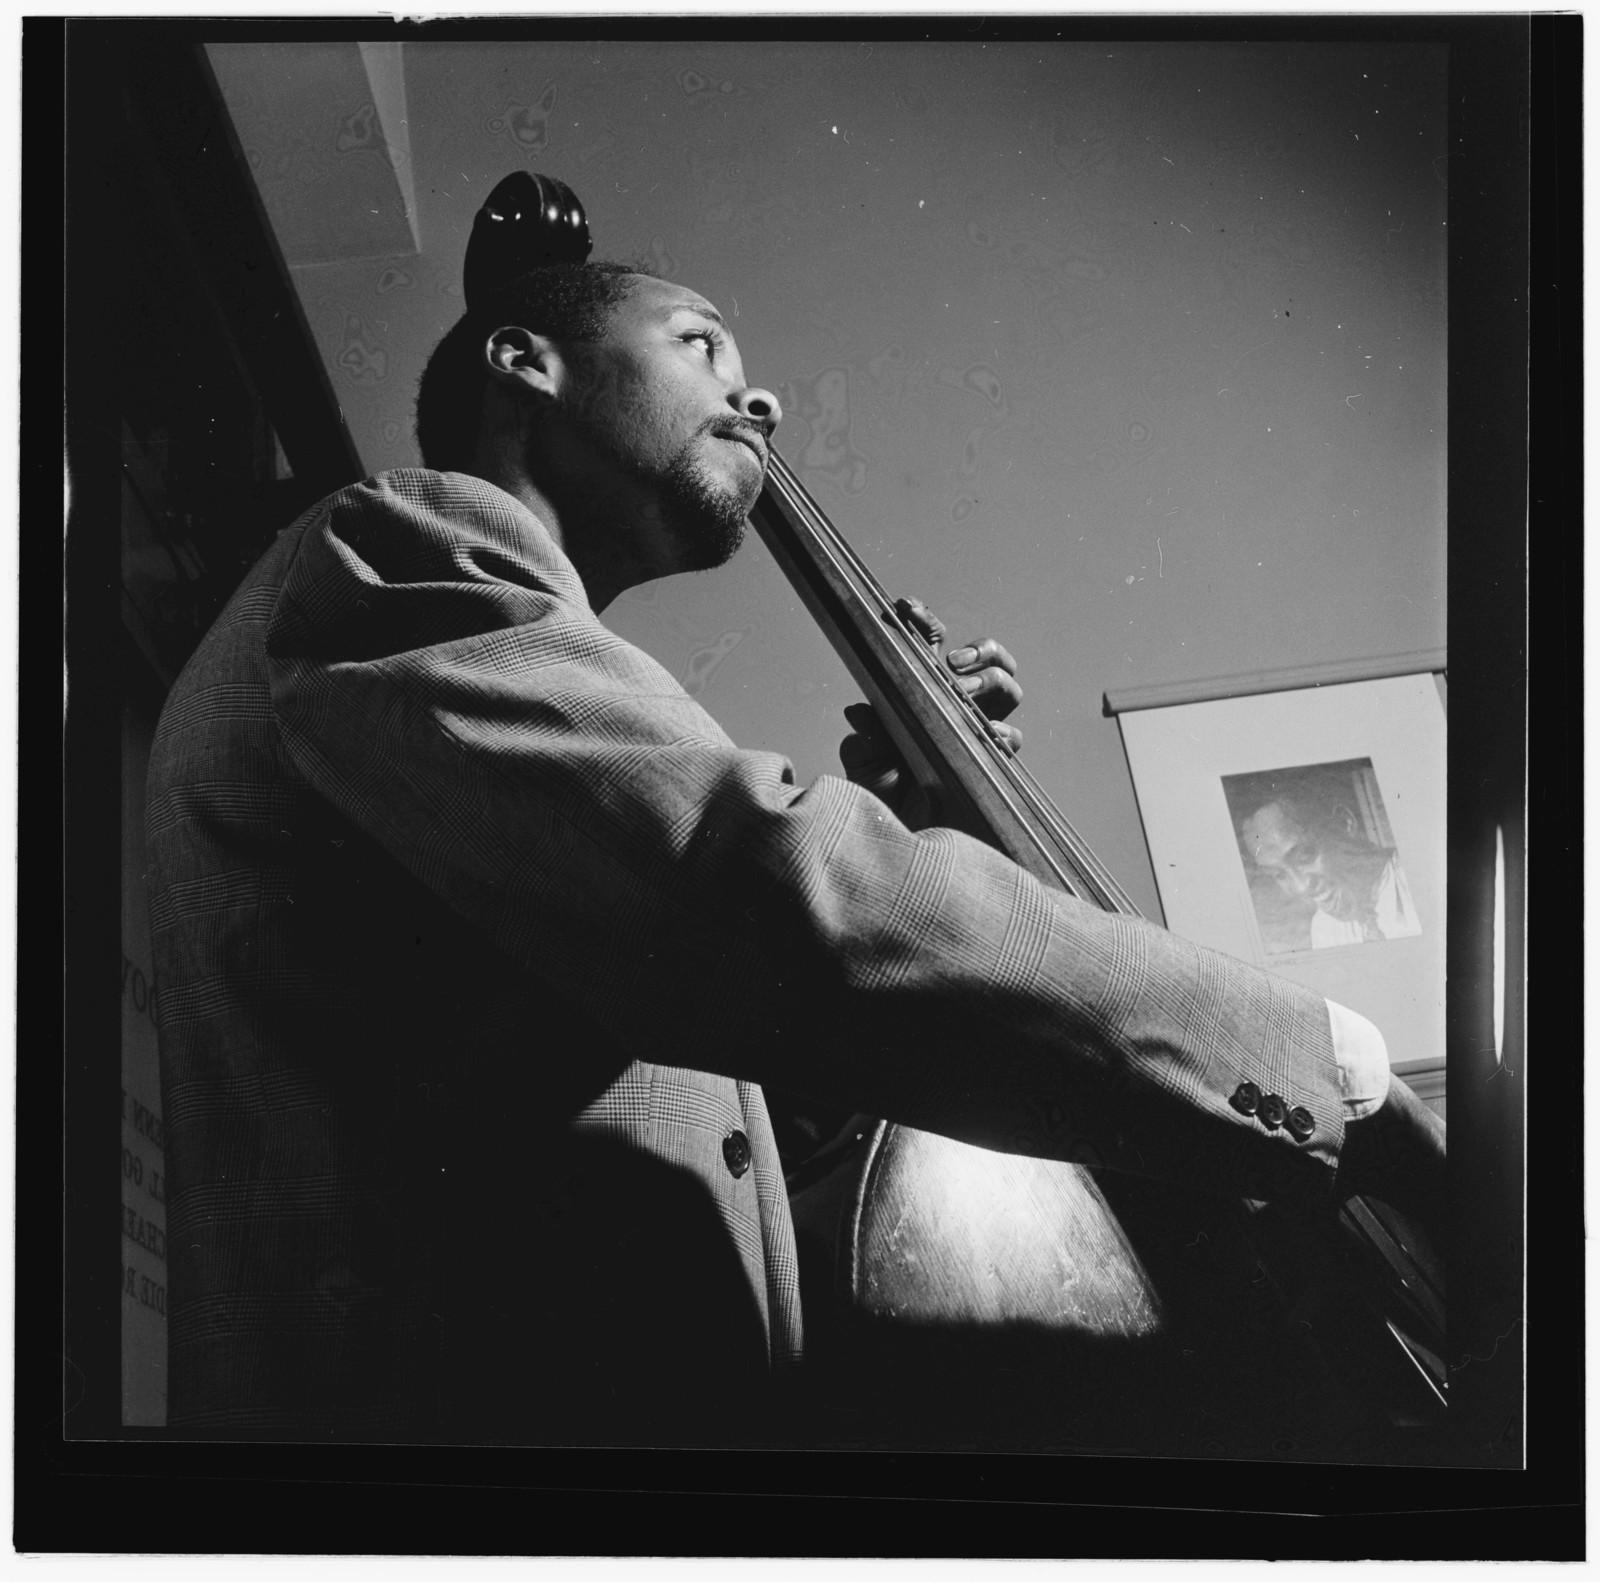 [Portrait of Slam Stewart, William P. Gottlieb's office, New York, N.Y., between 1946 and 1948]